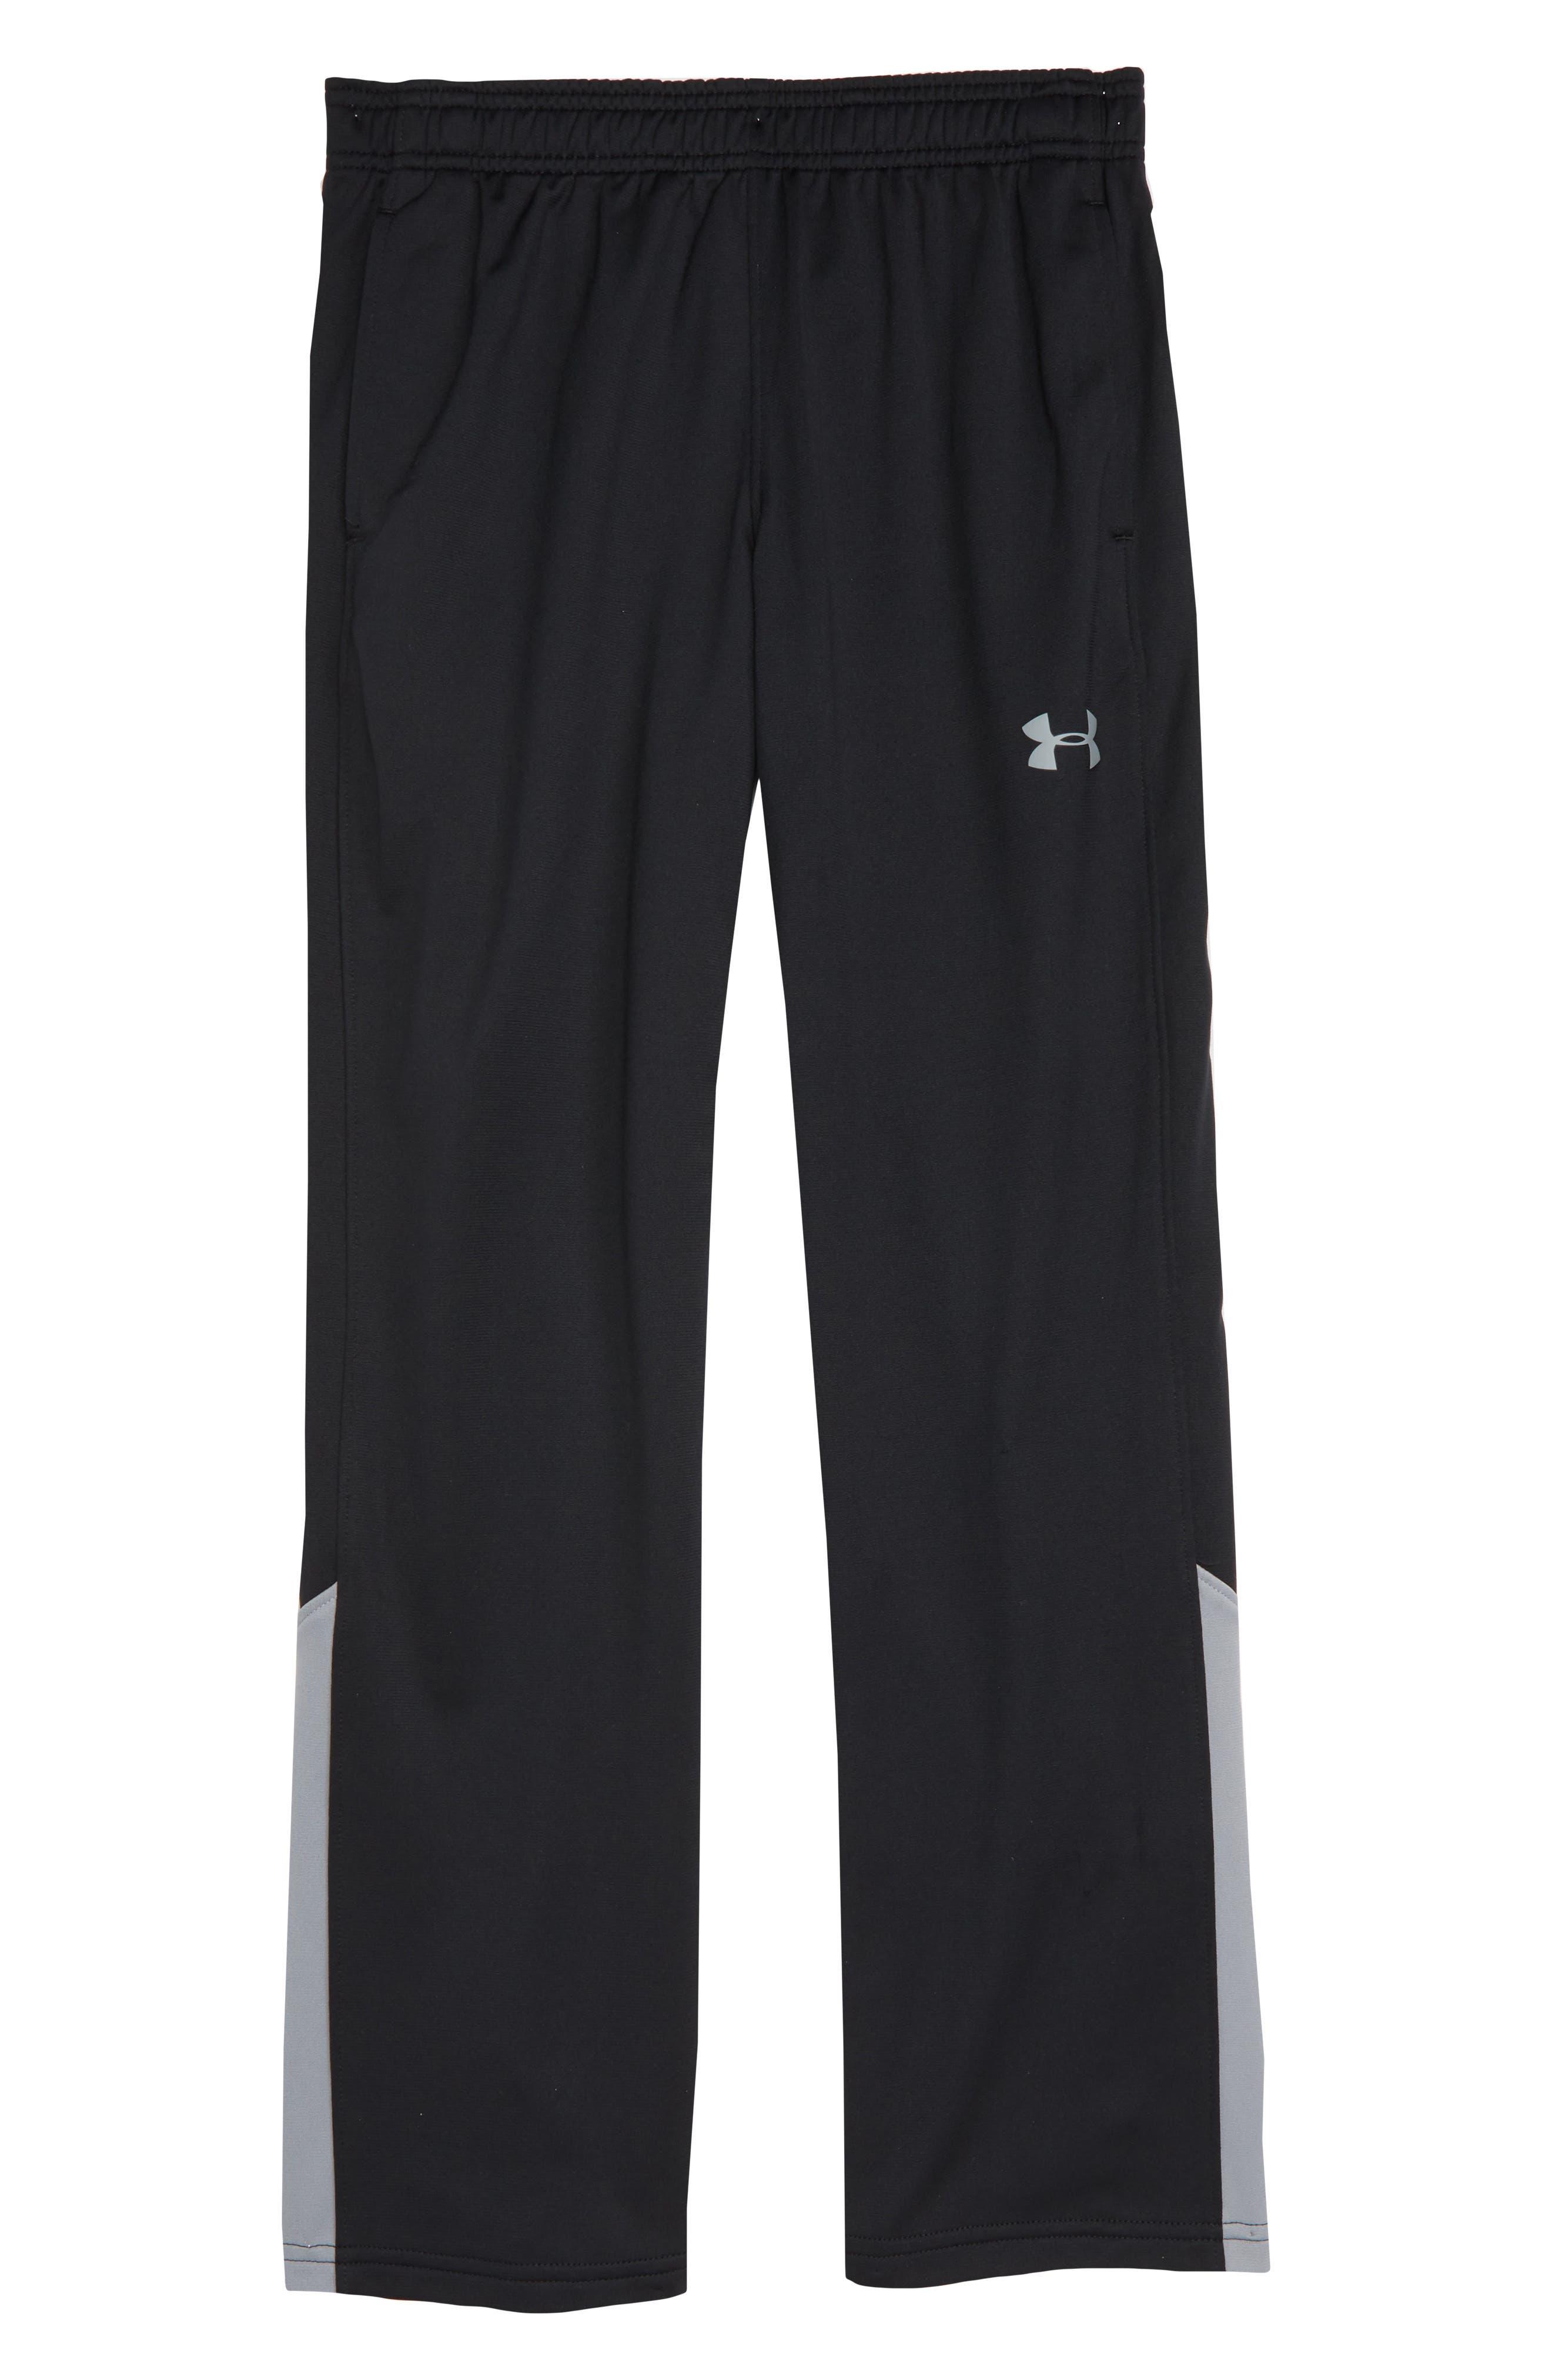 Brawler 2.0 Sweatpants,                         Main,                         color, BLACK/ STEEL